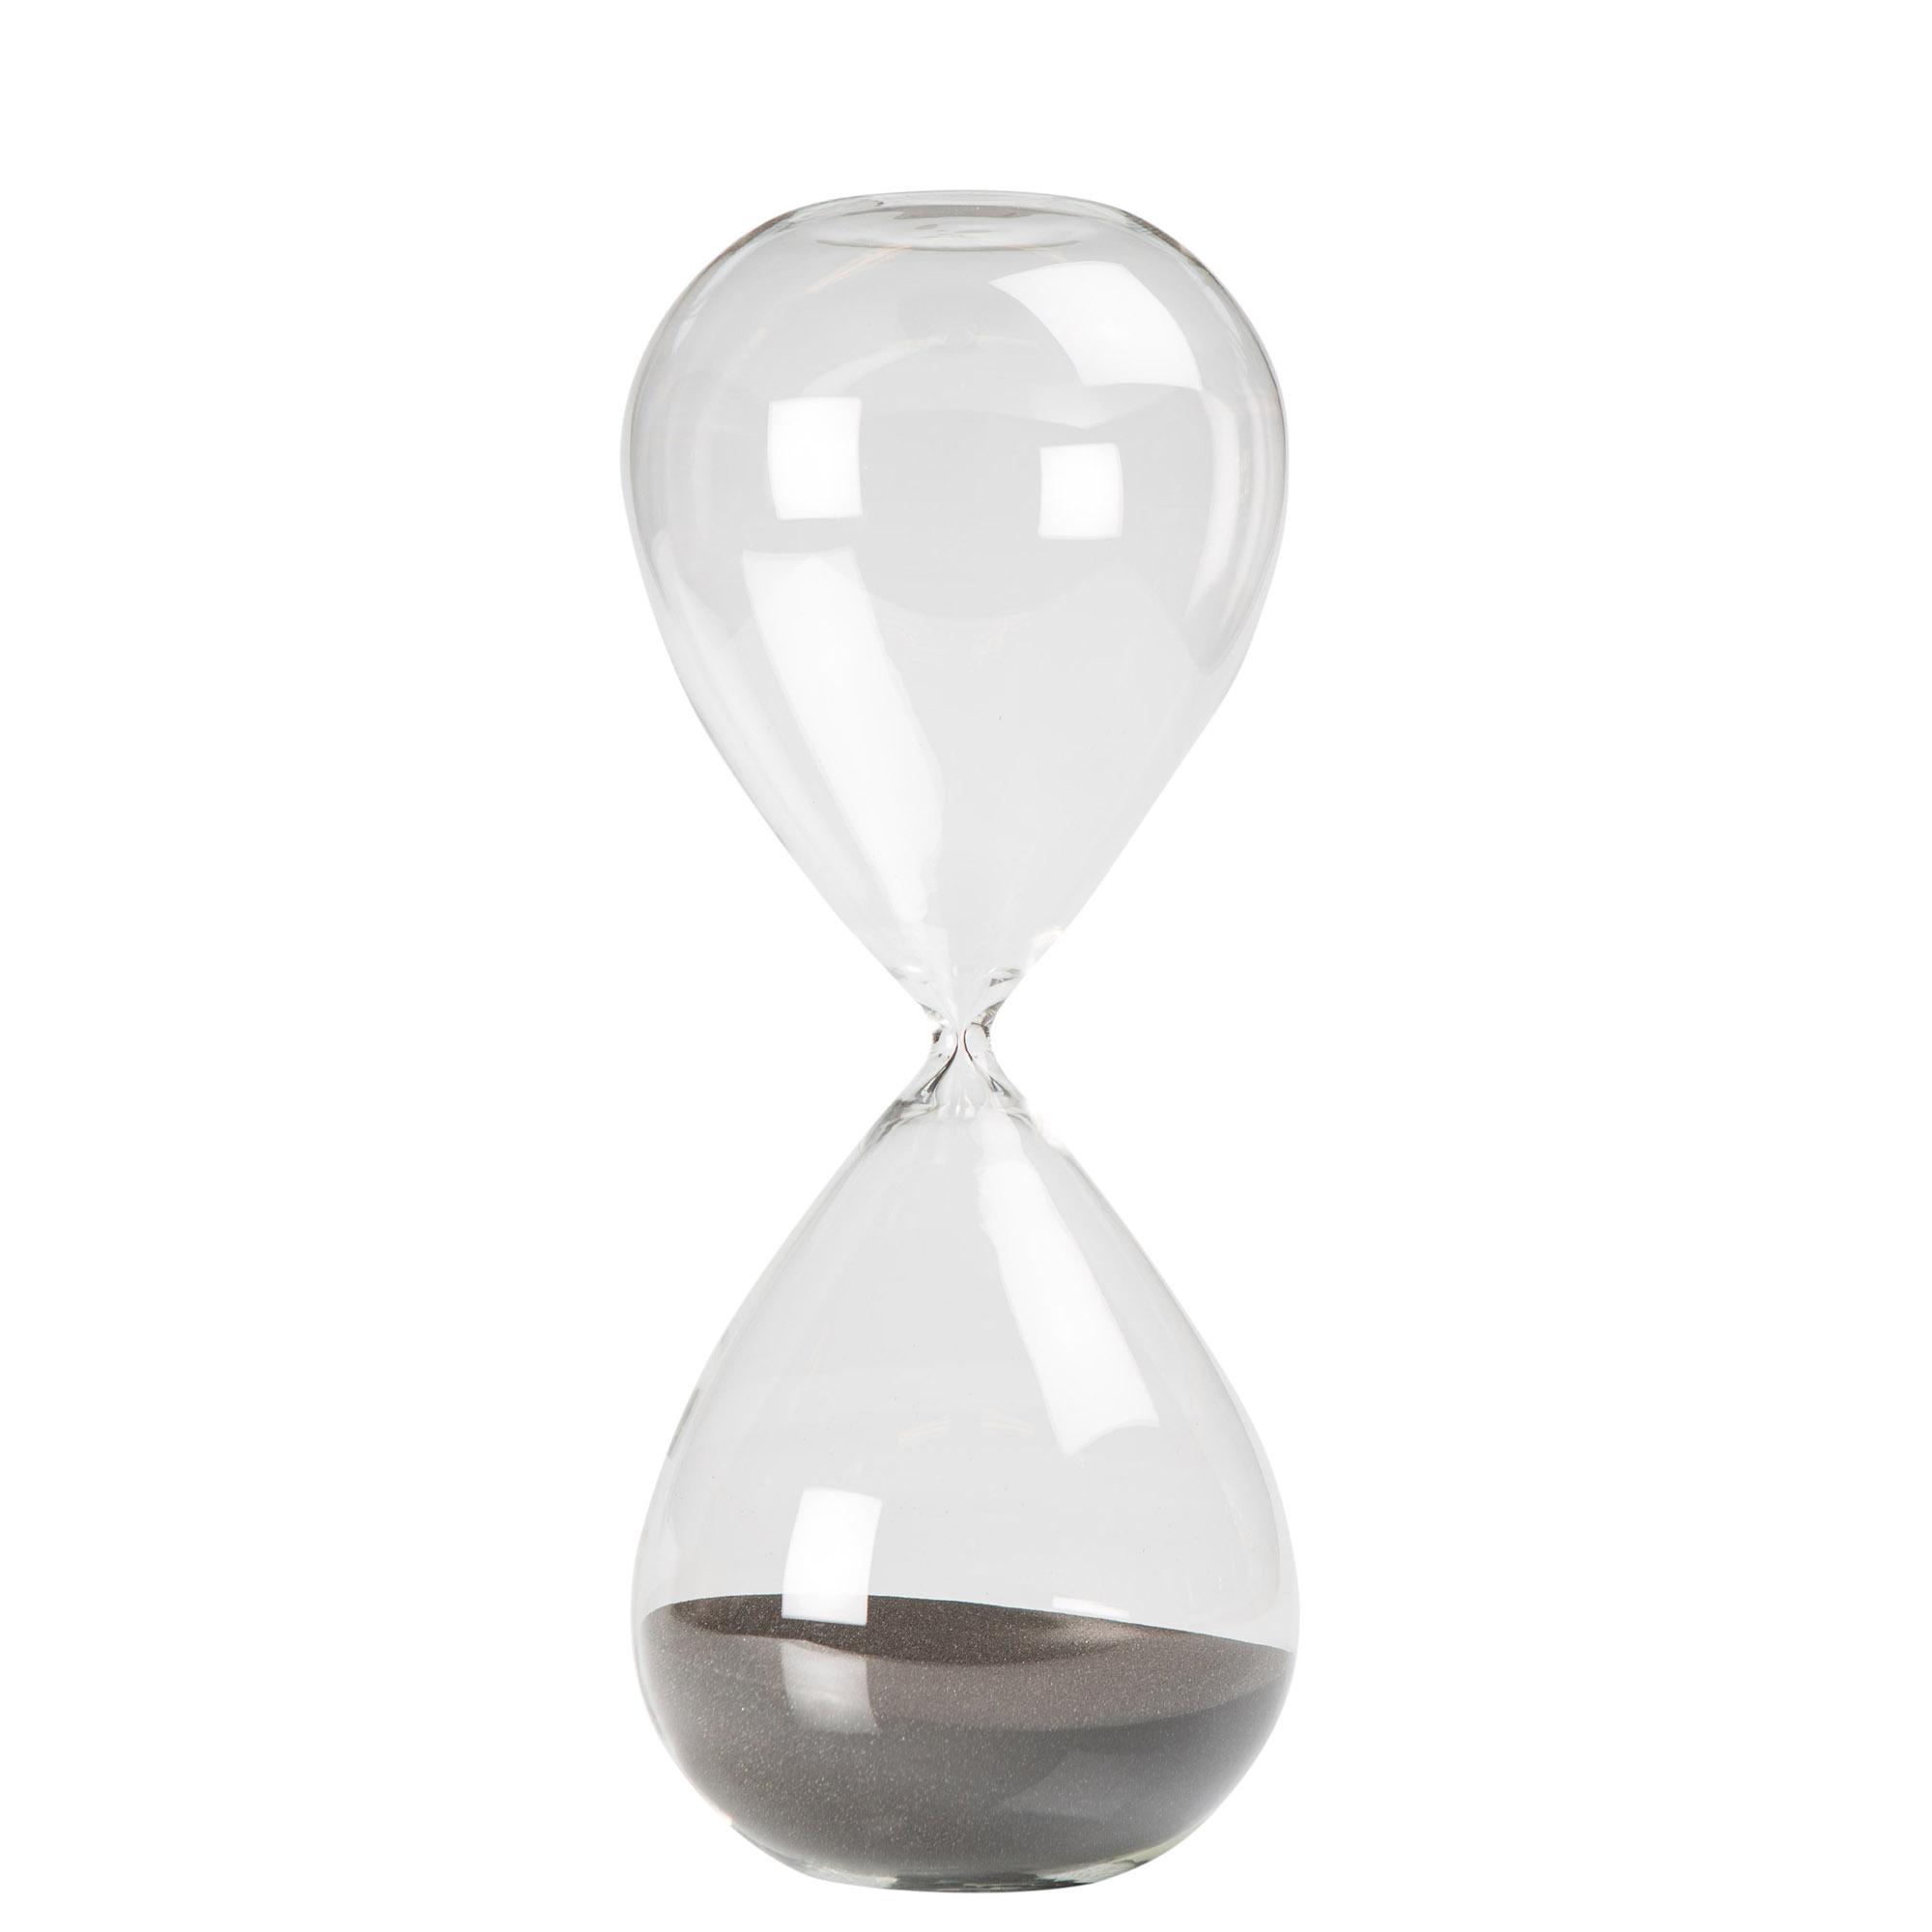 hour glass sand 1 minute